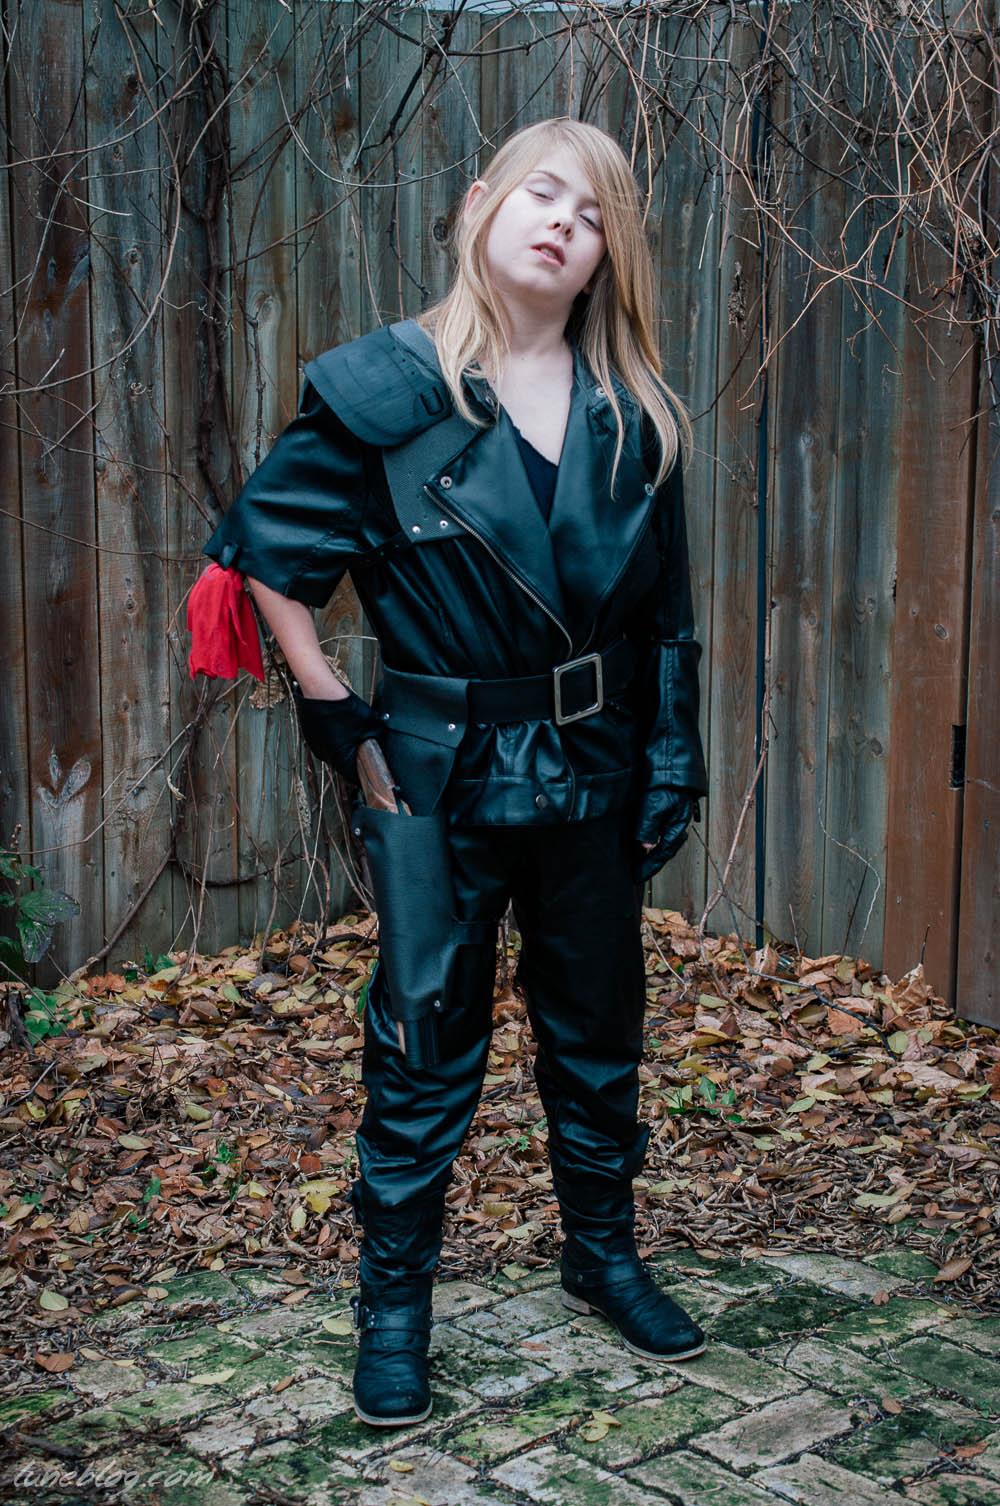 halloween costumes 2015 lune travels blog (24 of 39).jpg